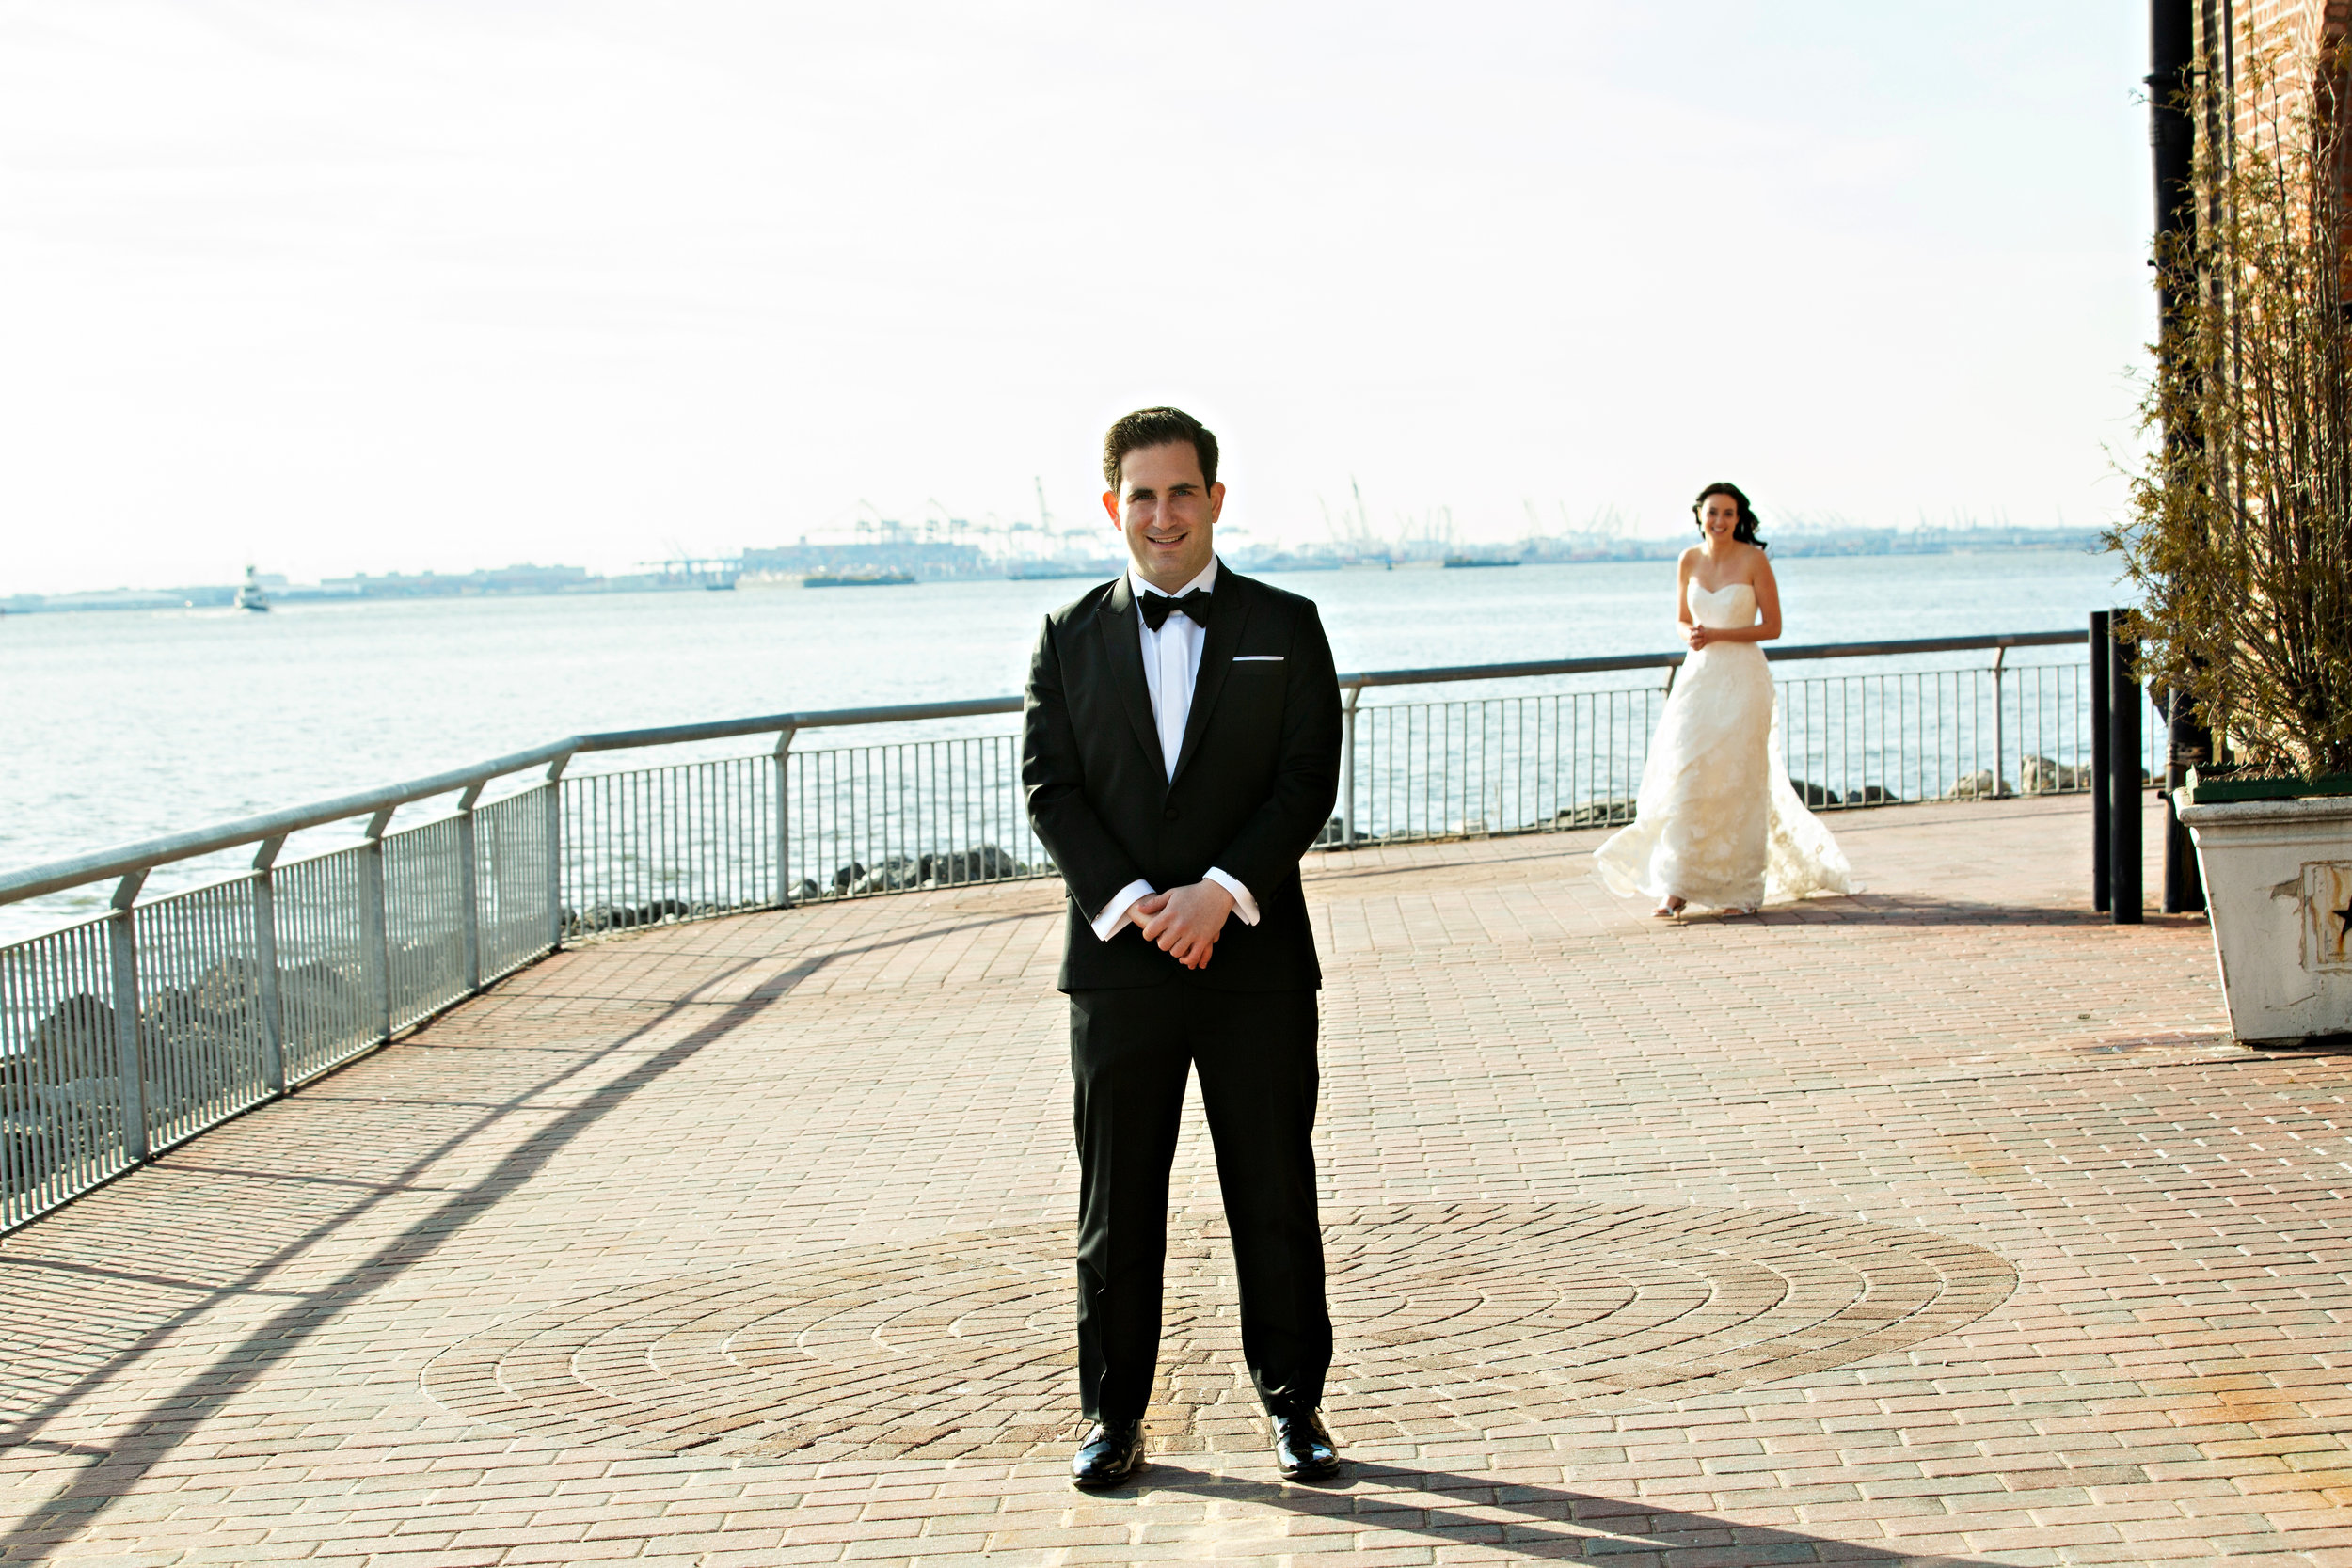 021719_c_d_wedding_0022.JPG